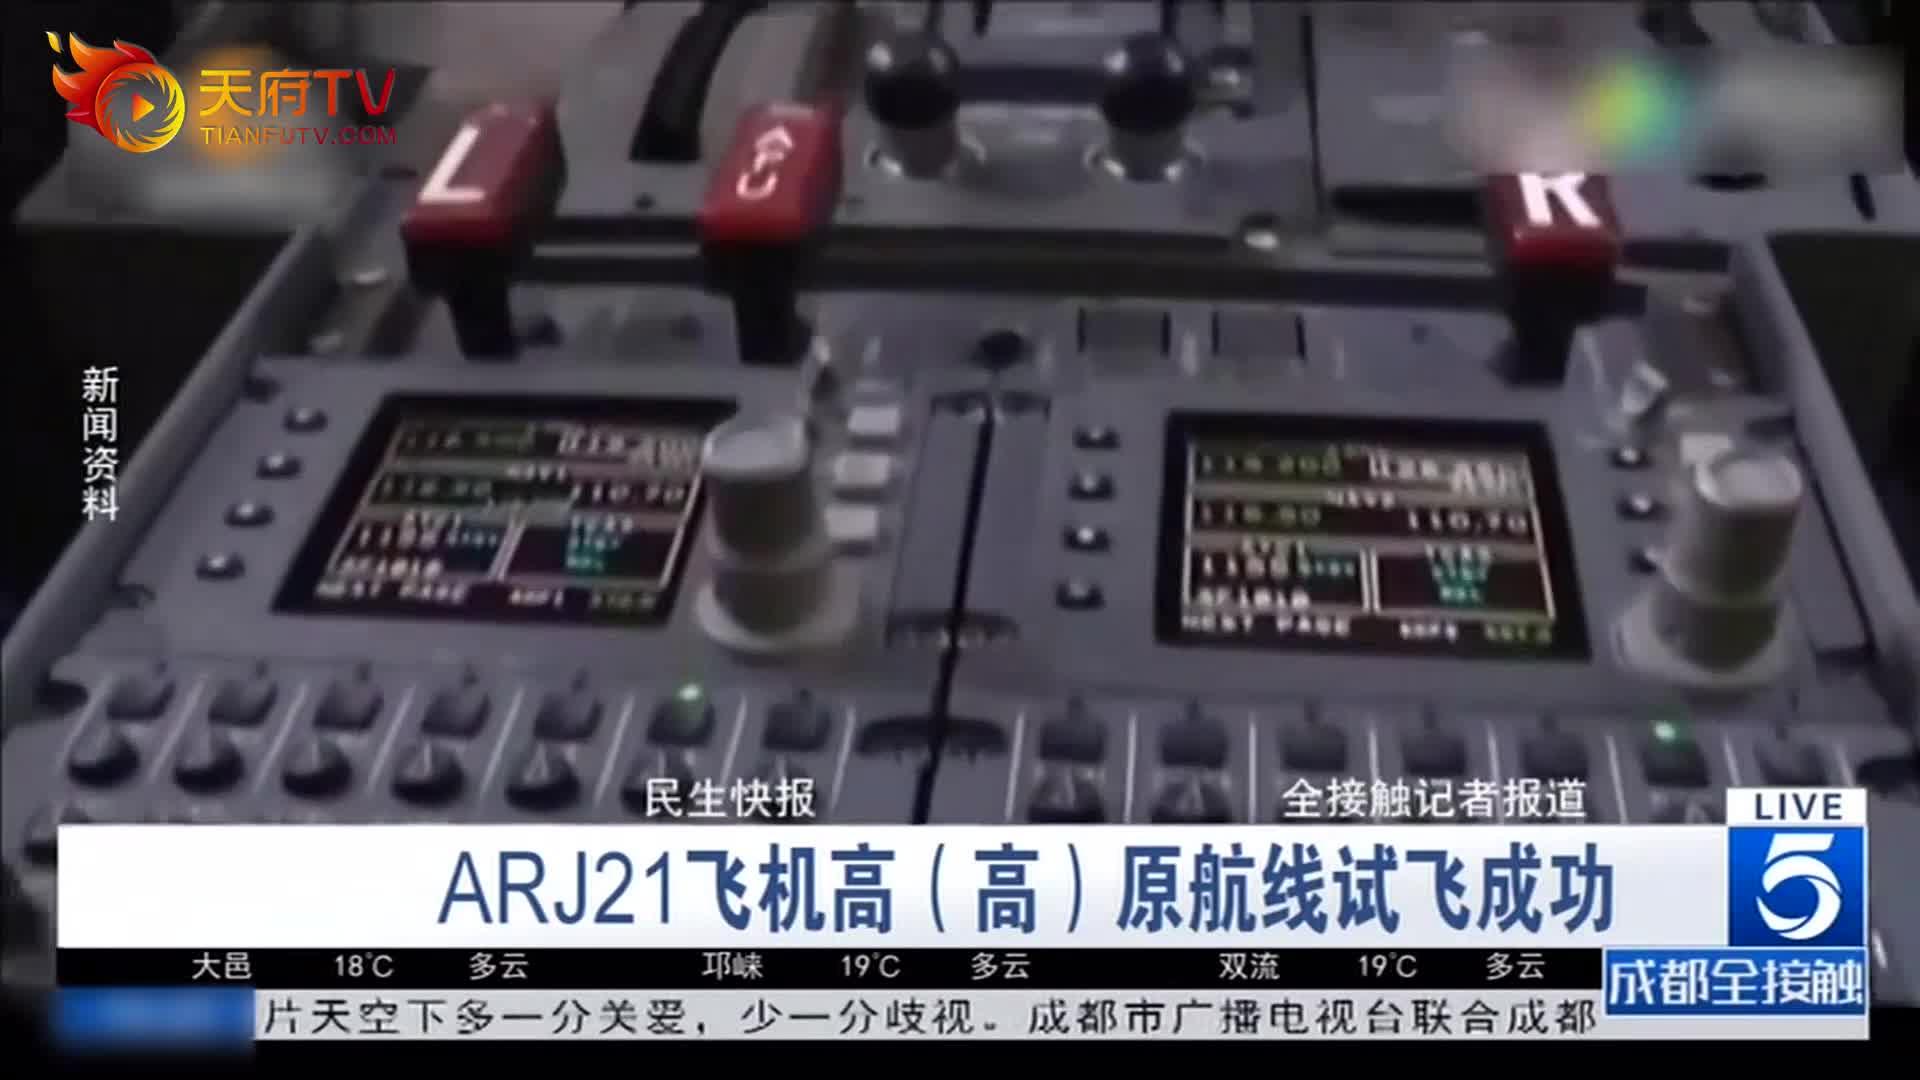 ARJ21飞机高原航线试飞成功